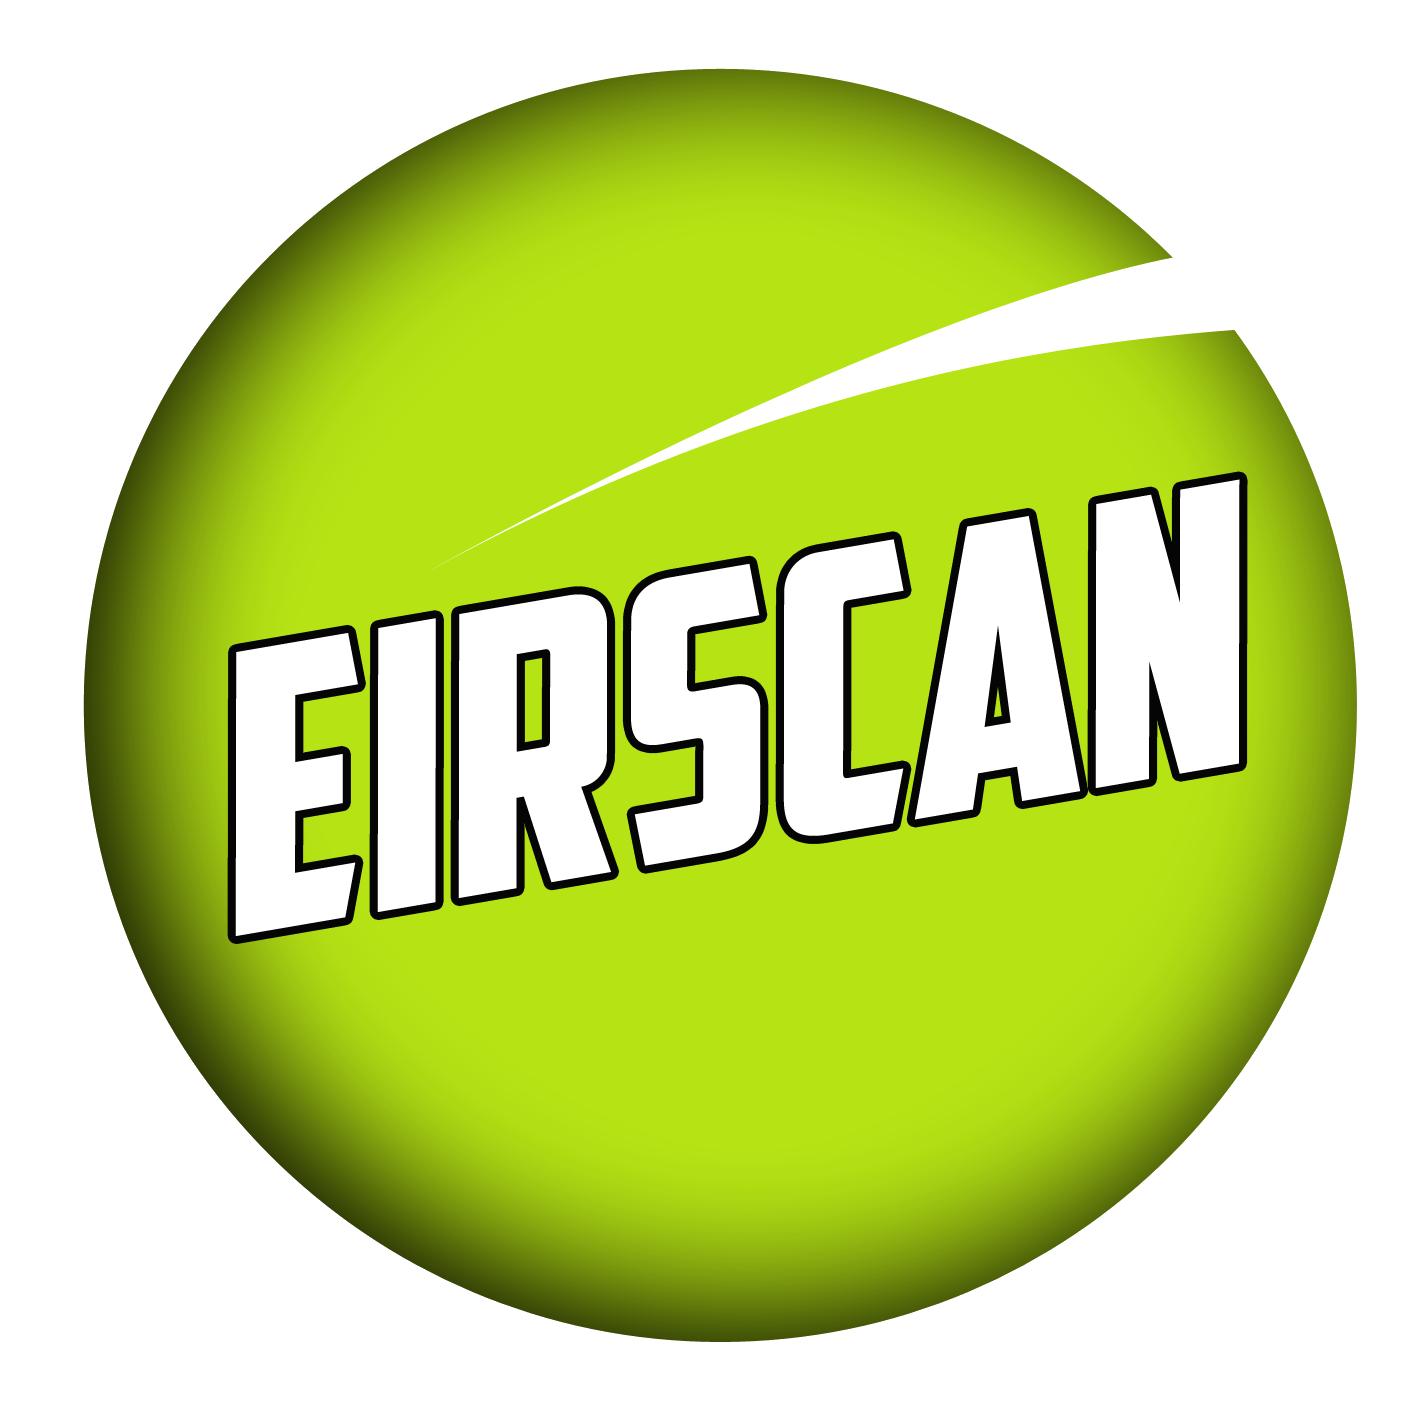 eirscan – delivering increased food safety assurance